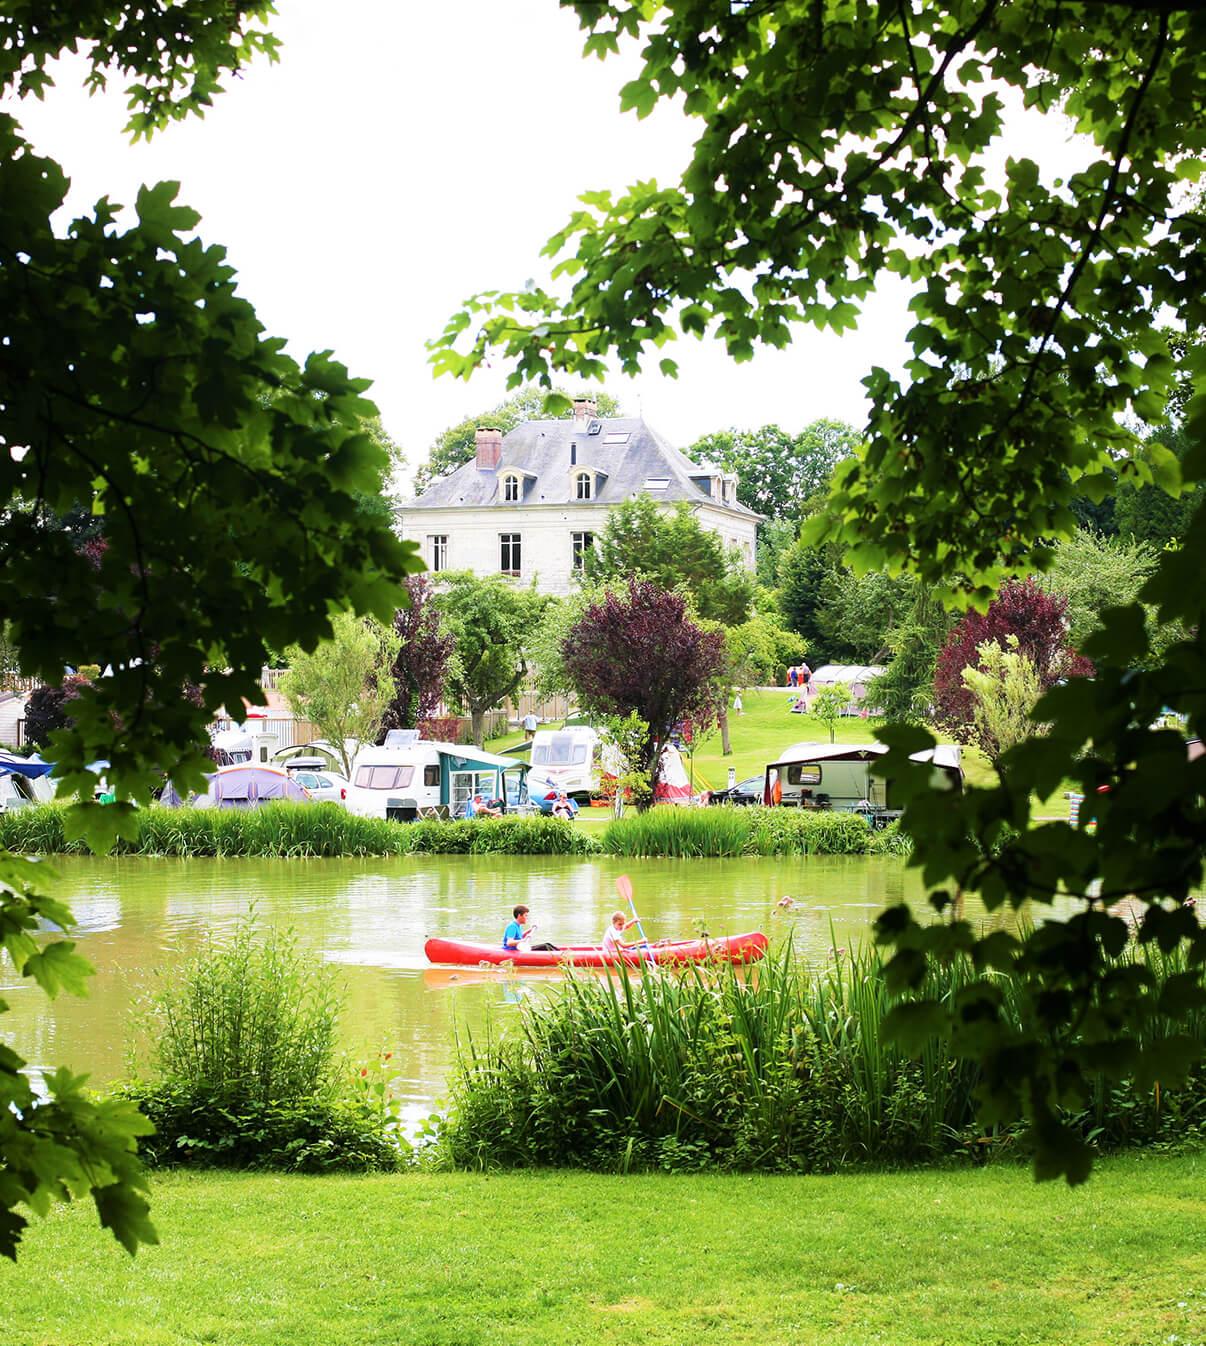 Camping 4 étoiles en Normandie - Emplacements en bord d'étang